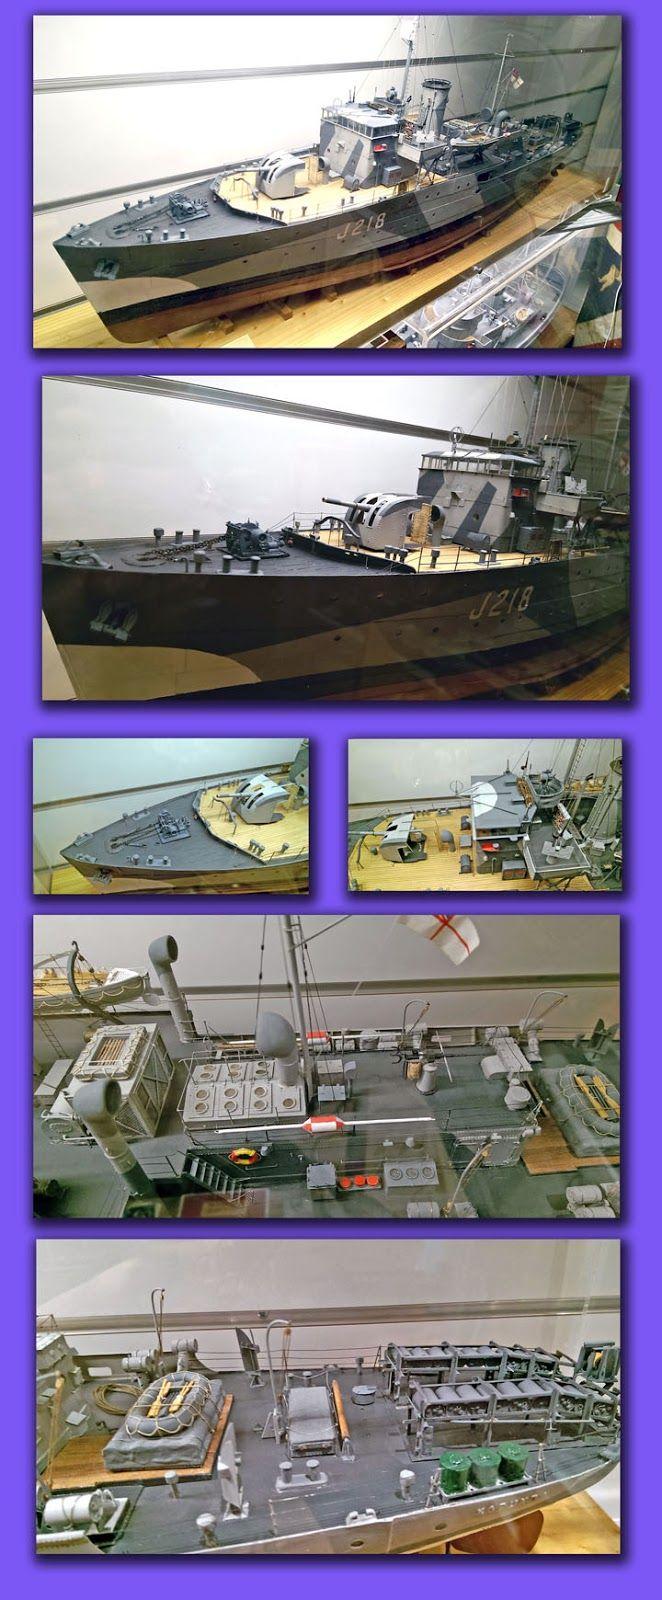 HMAS KAPUNDA (J218/M218) was one of 60 Bathurst Class Corvettes